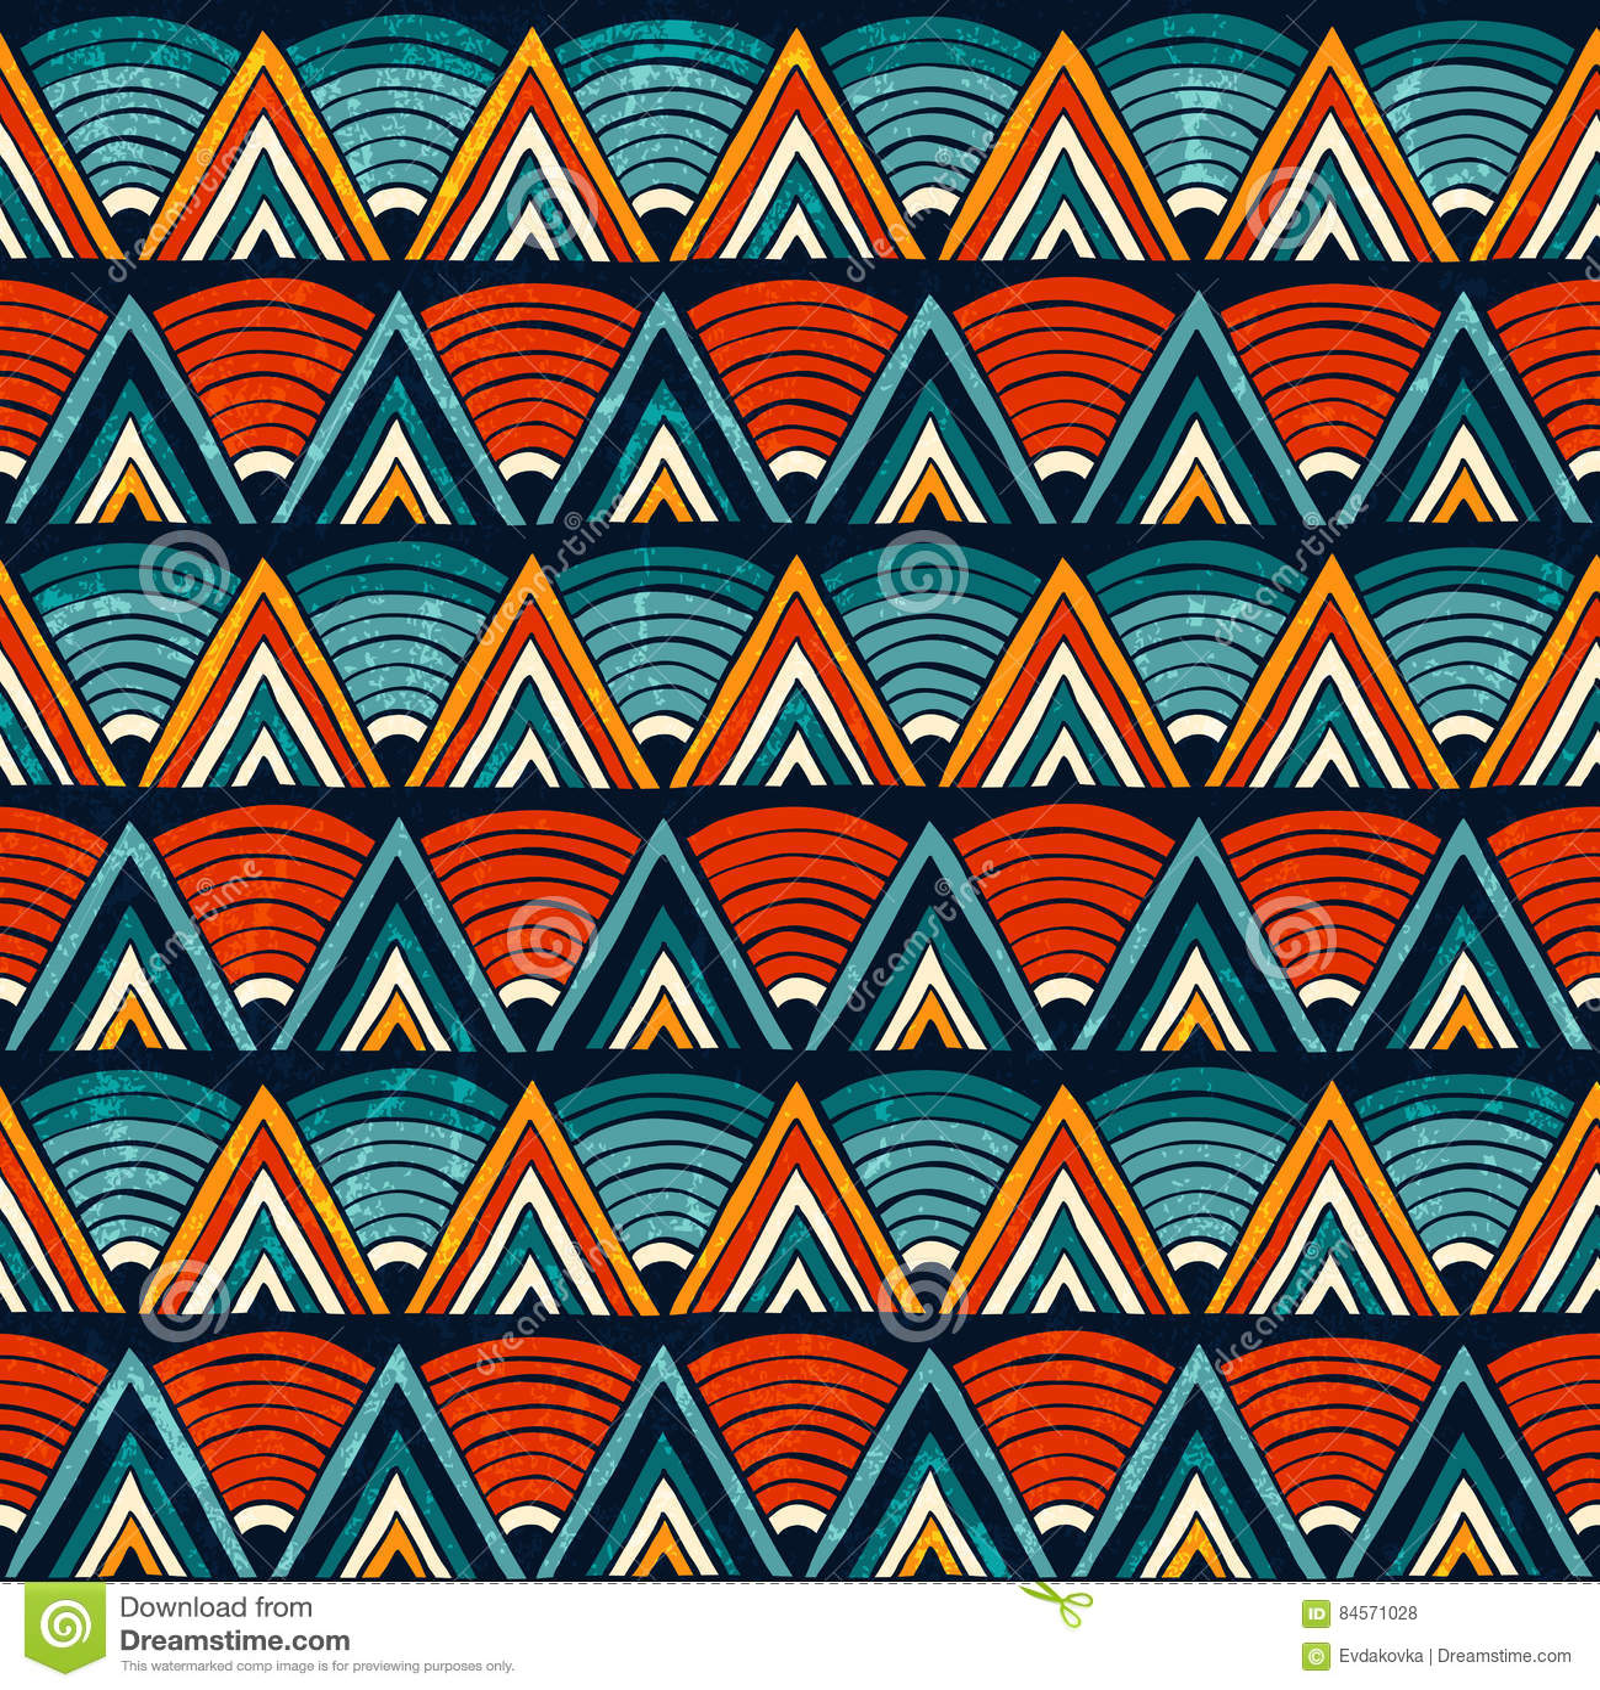 Ornamento Tribal En Colores Vibrantes Fondo Abstracto Inconsútil Del